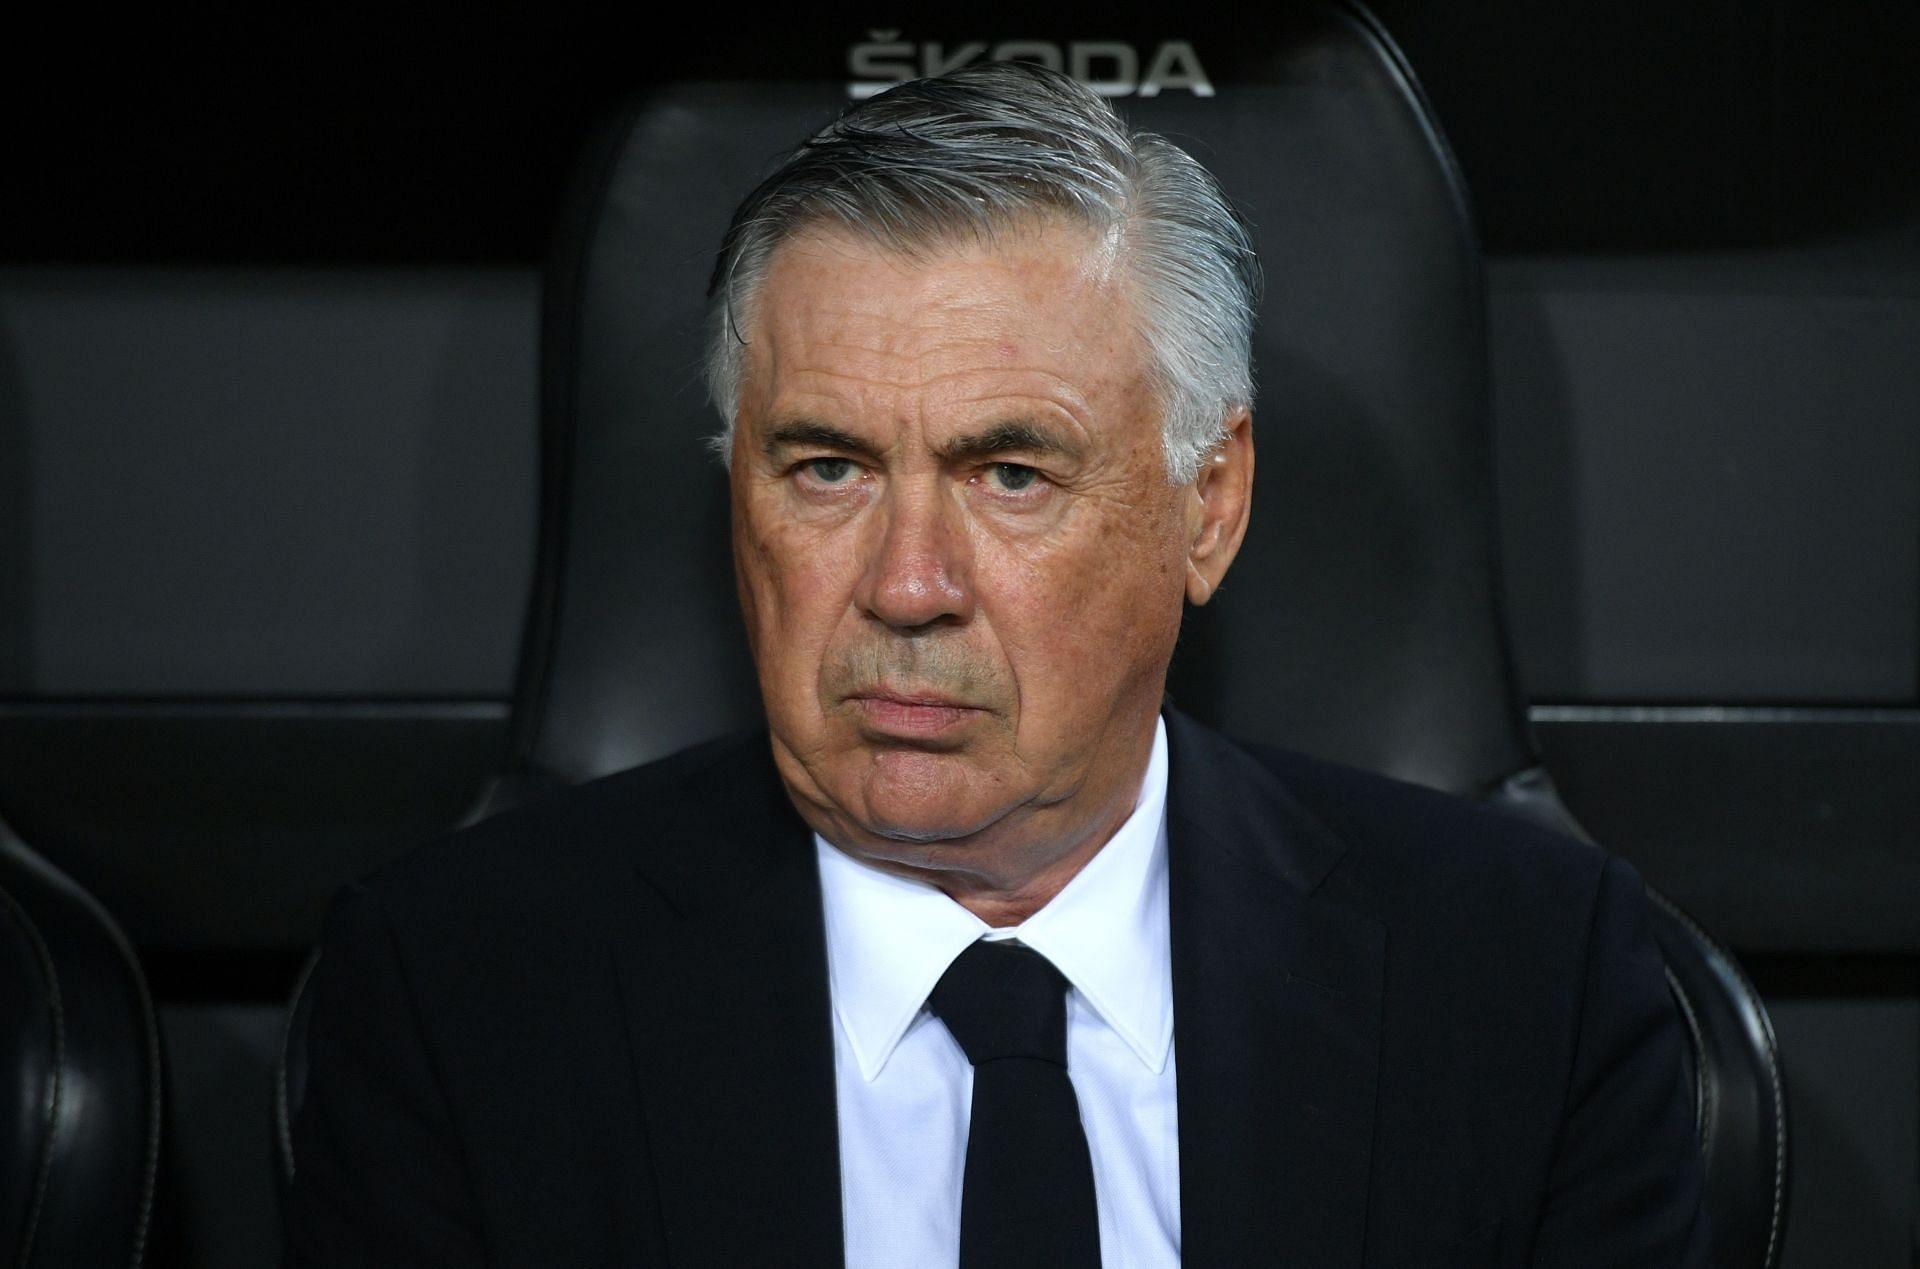 Real Madrid Transfer News Roundup: Los Blancos interested in Italian star; AC Milan midfielder prefers move to Santiago Bernabeu